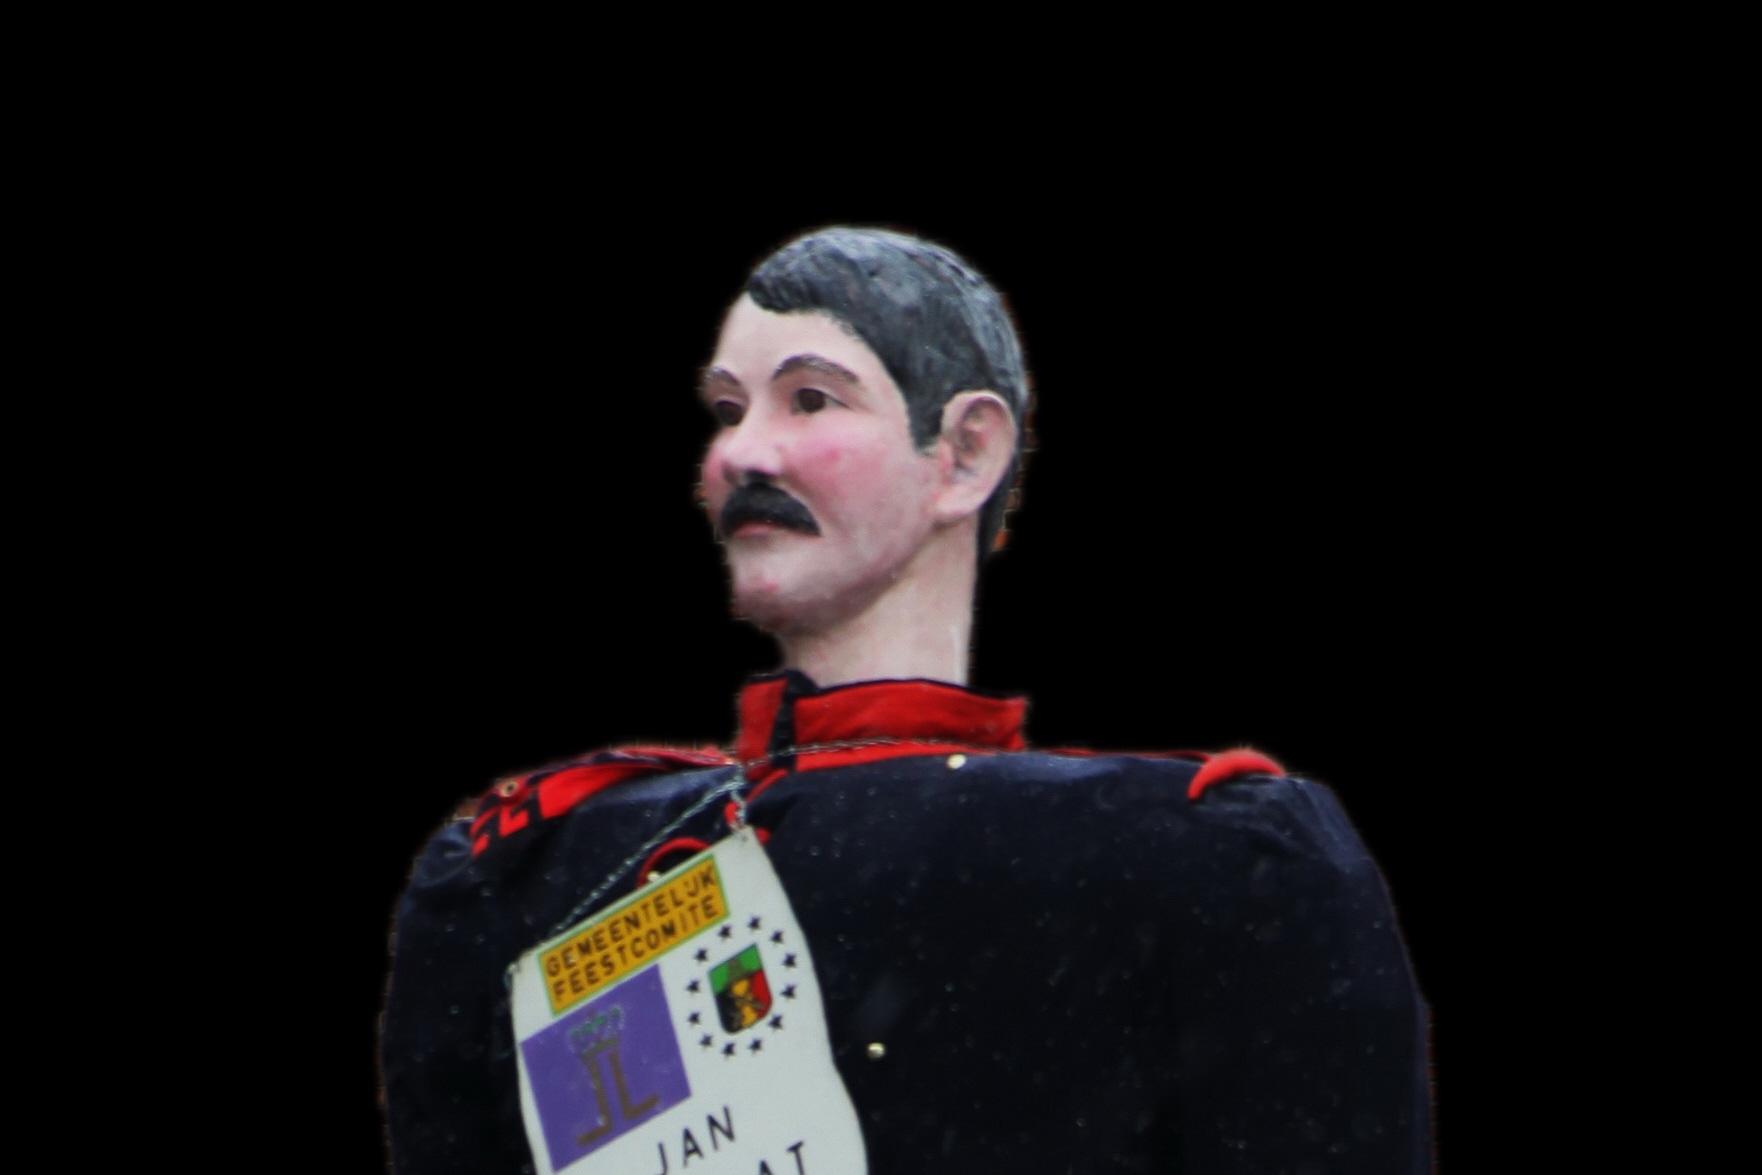 Jan Soldaat